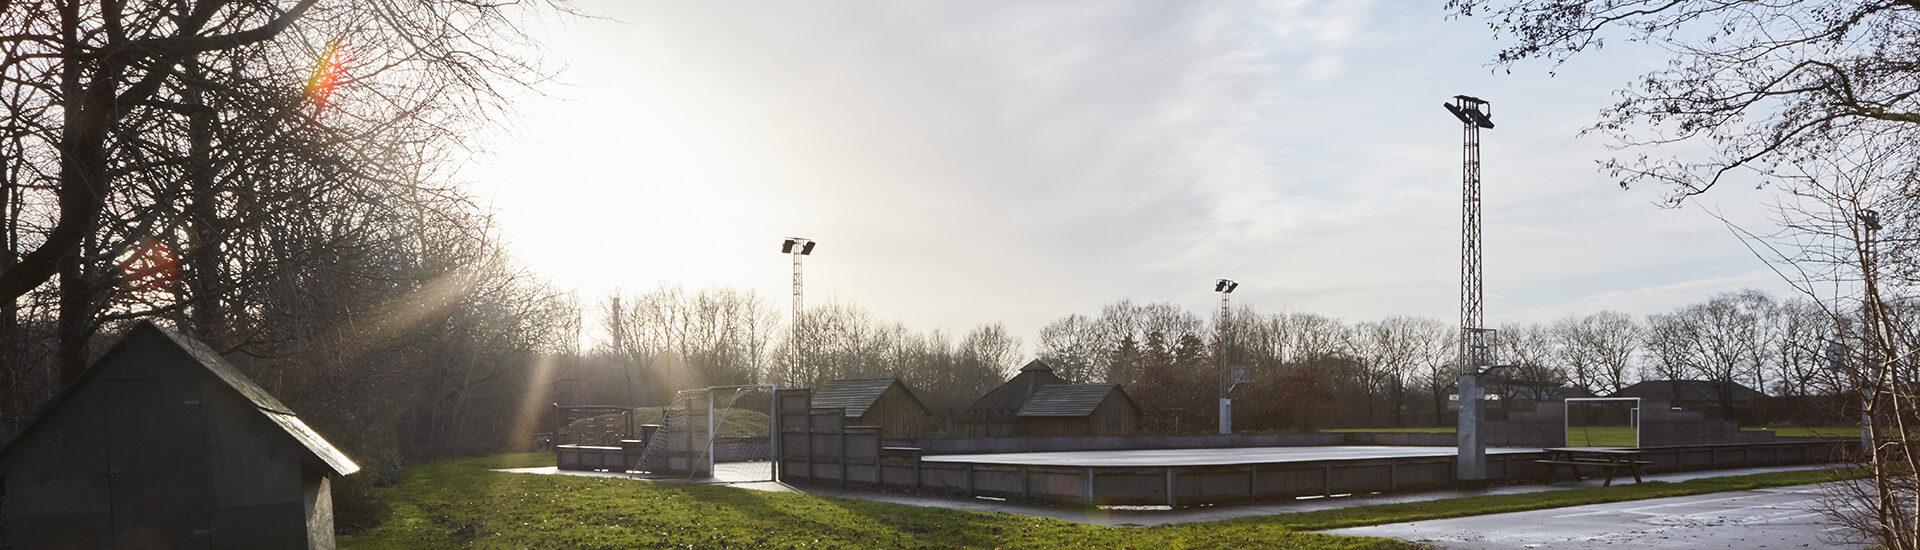 Snejbjerg, Multibane